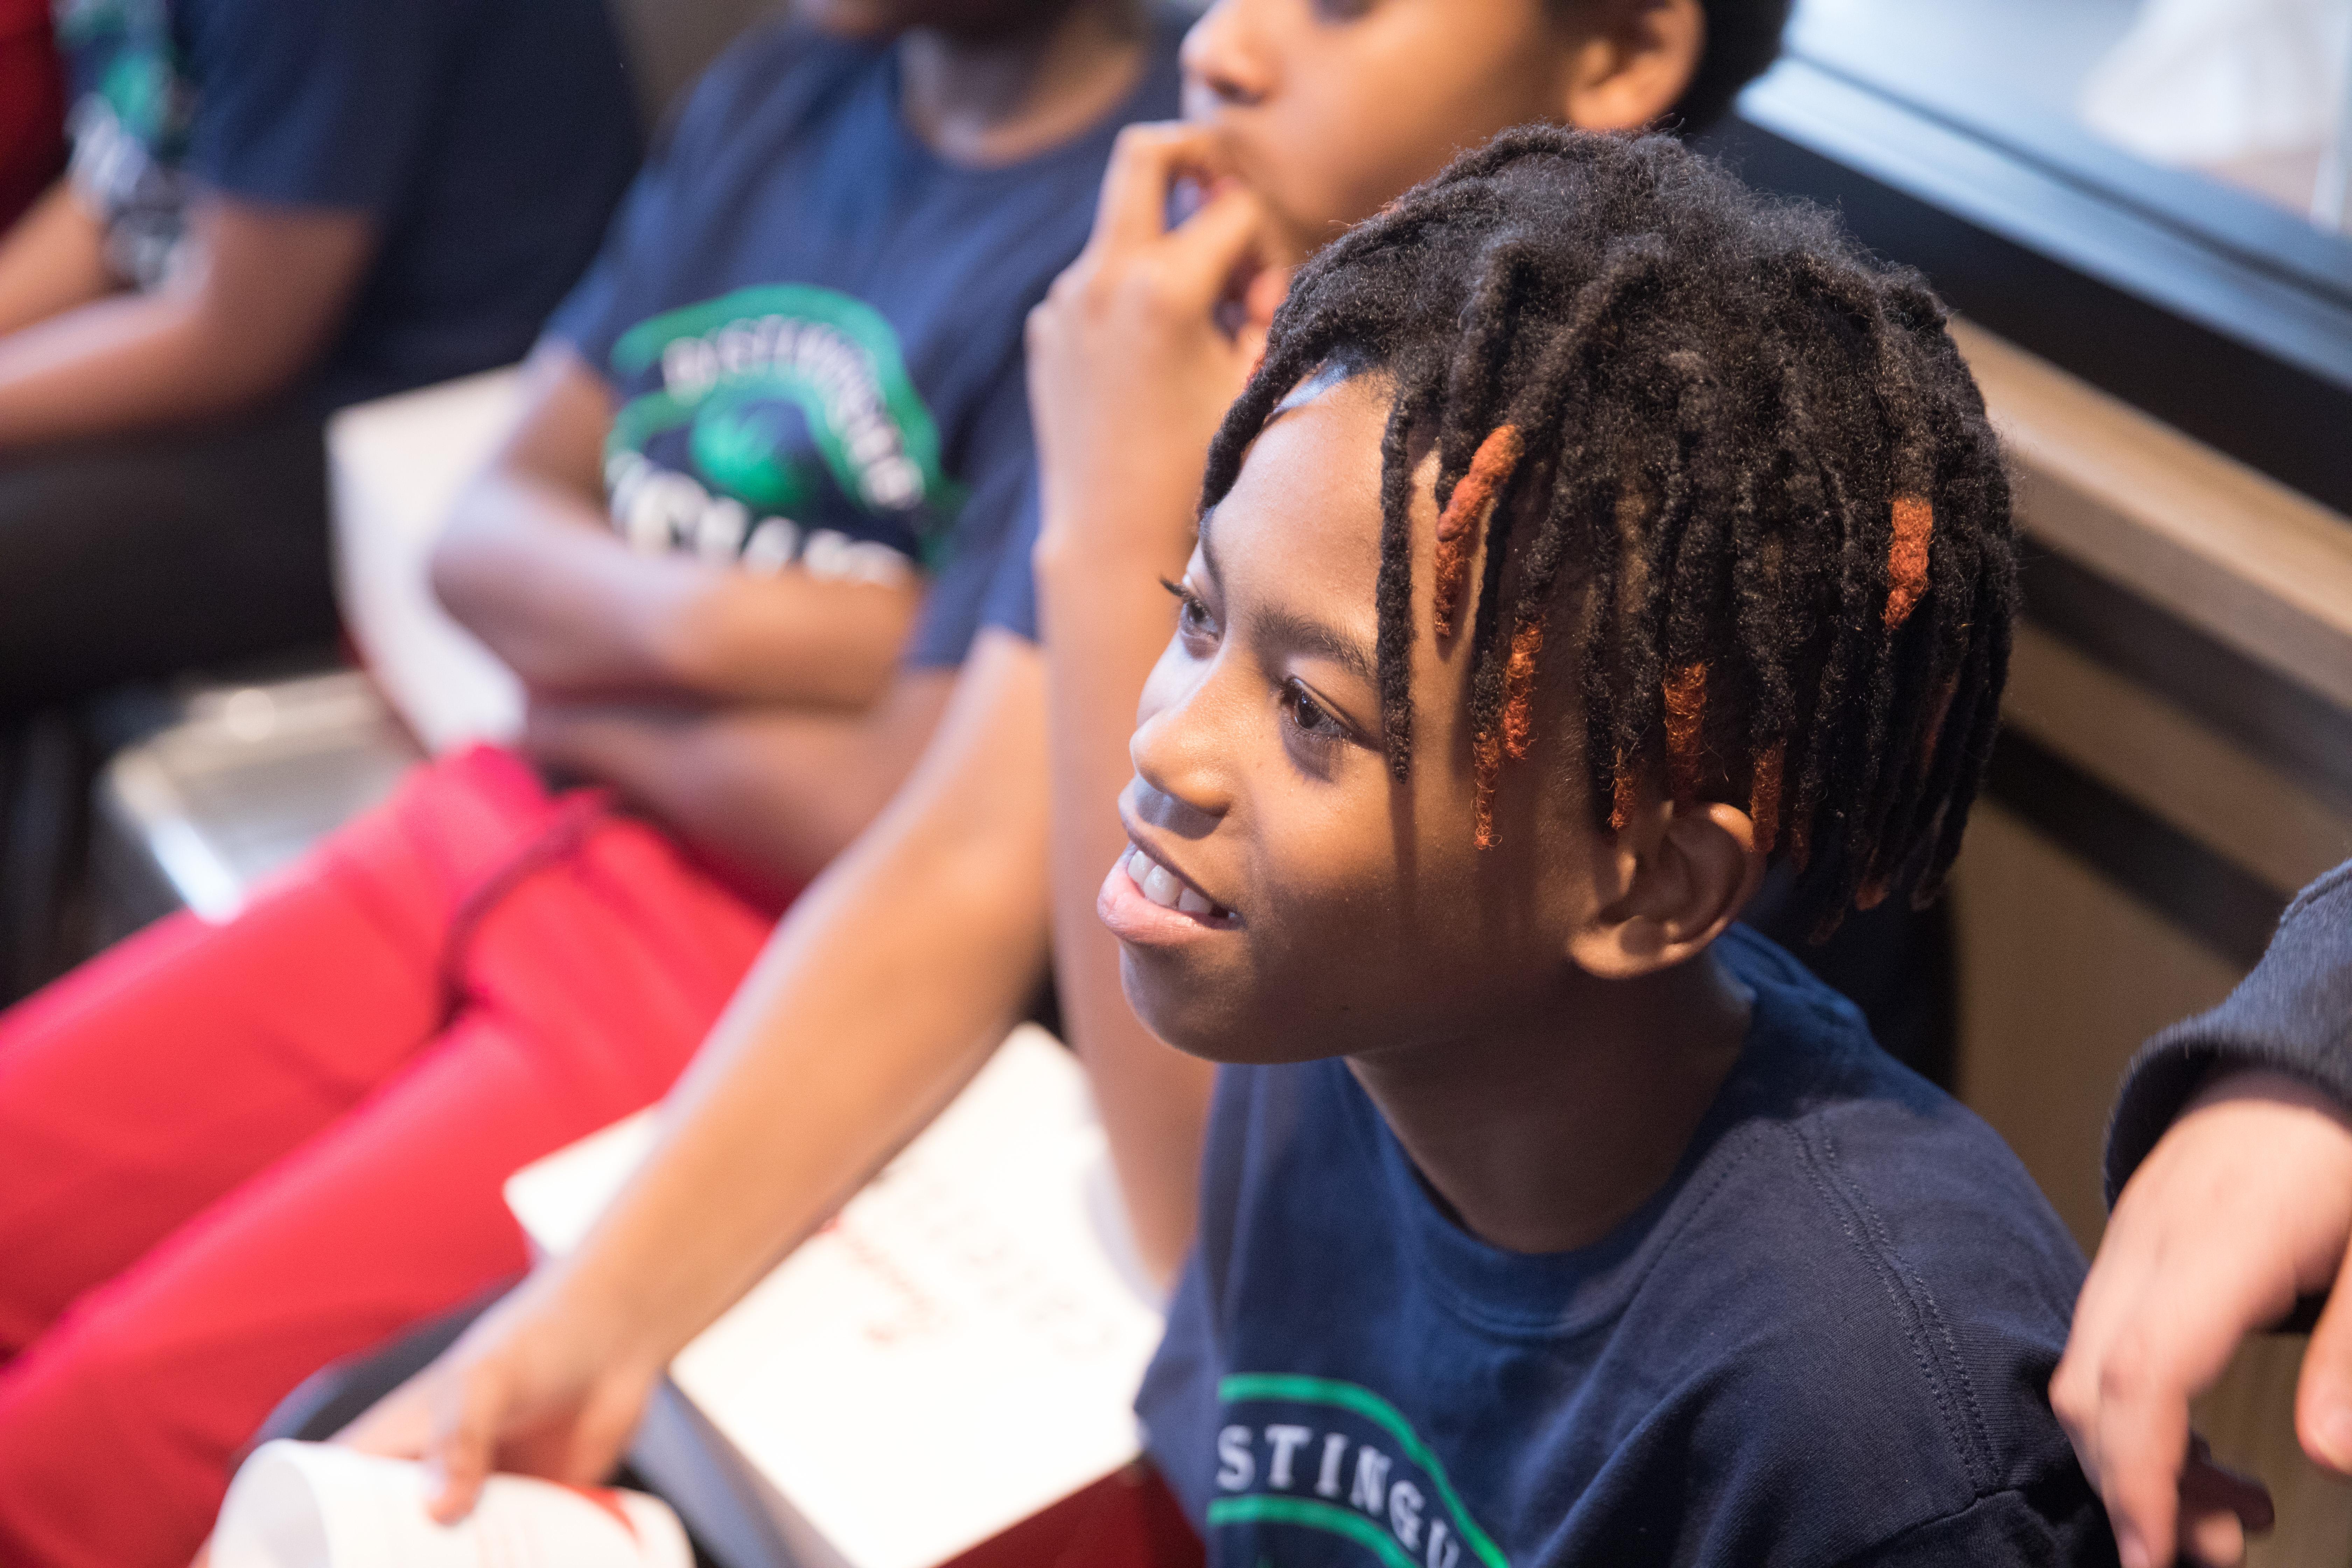 Introducing Hollis Kingz: A mentoring program for young men